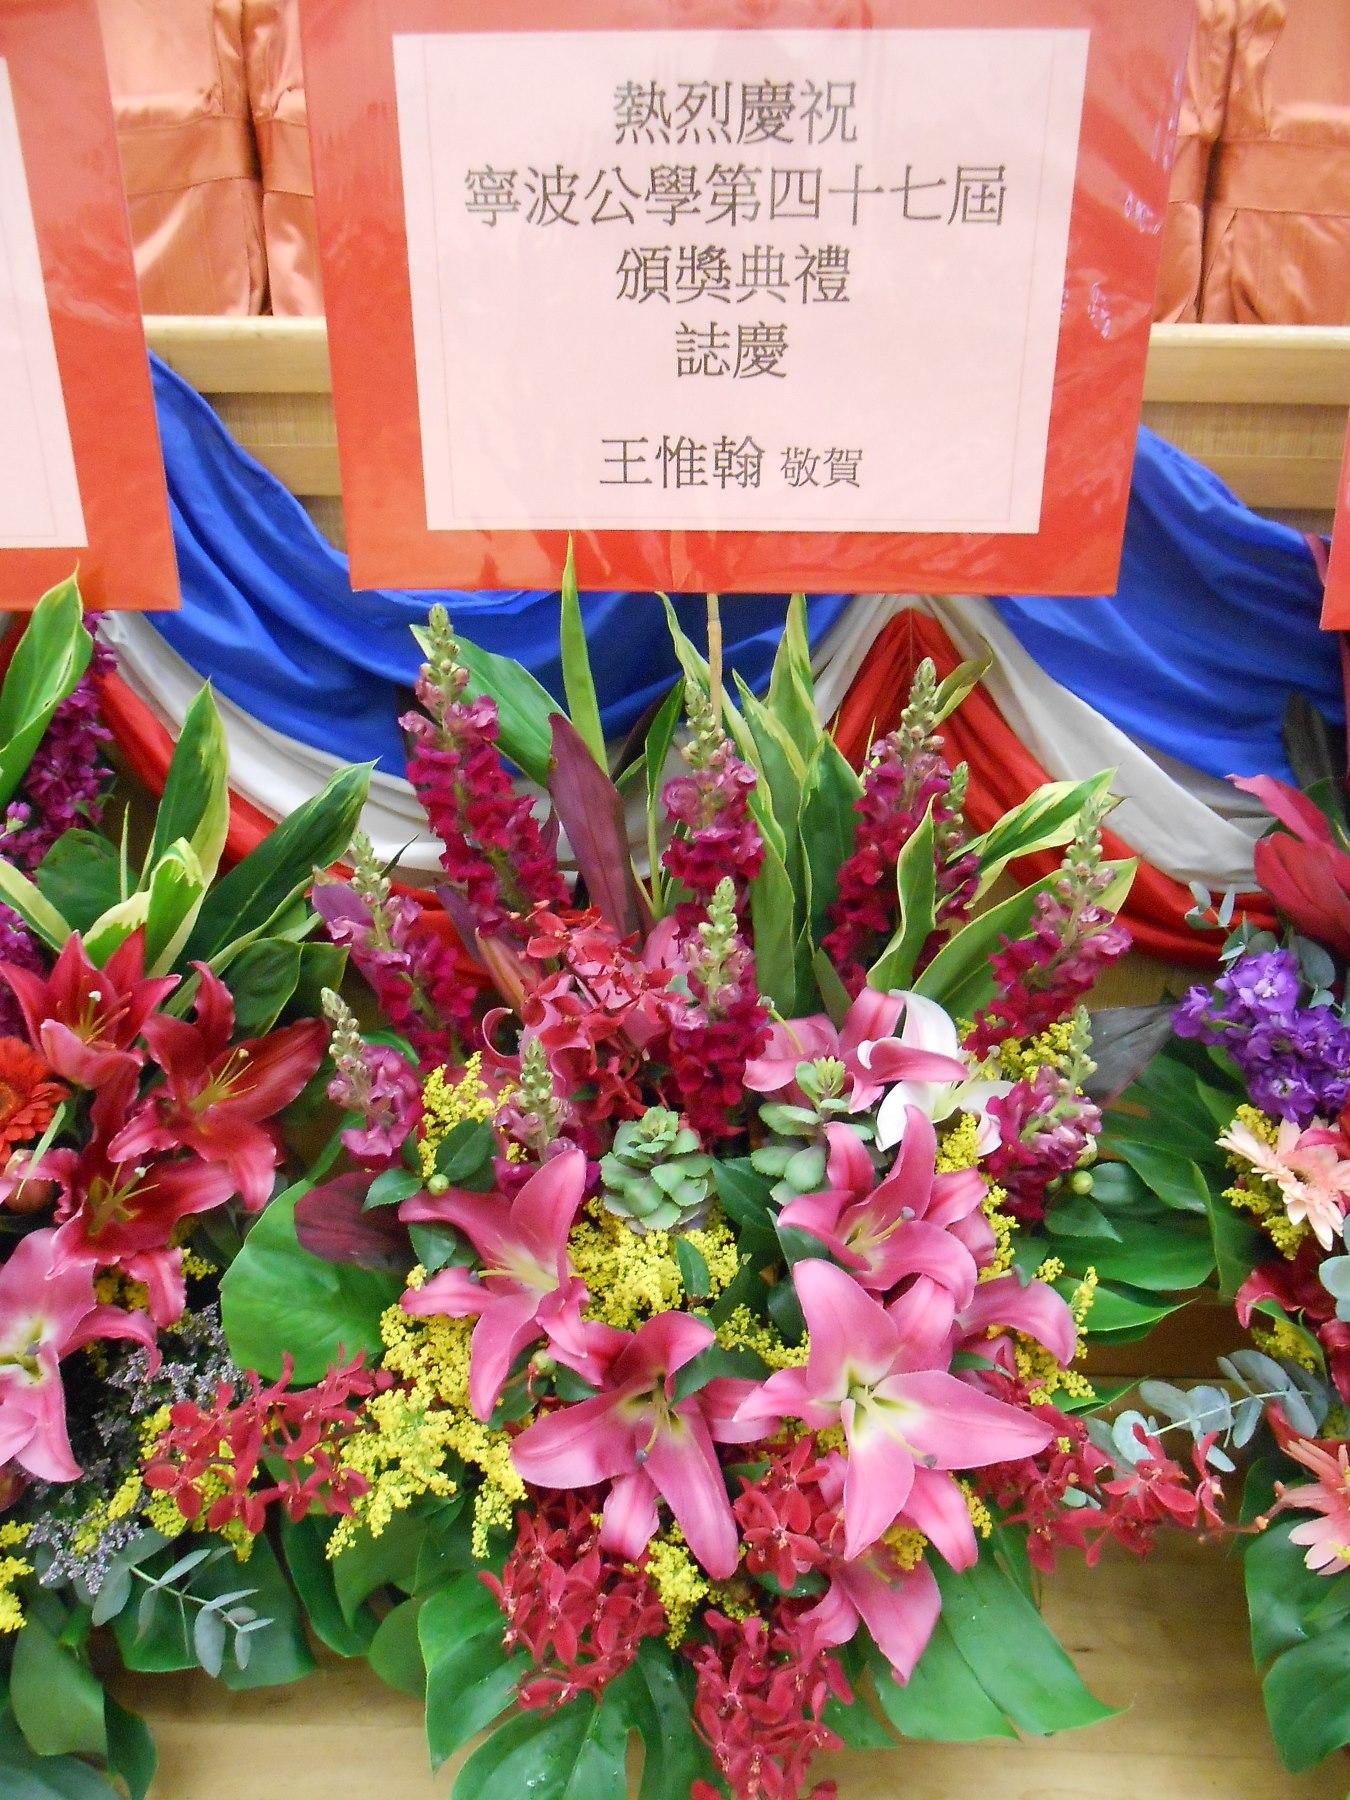 http://npc.edu.hk/sites/default/files/dscn9736.jpg